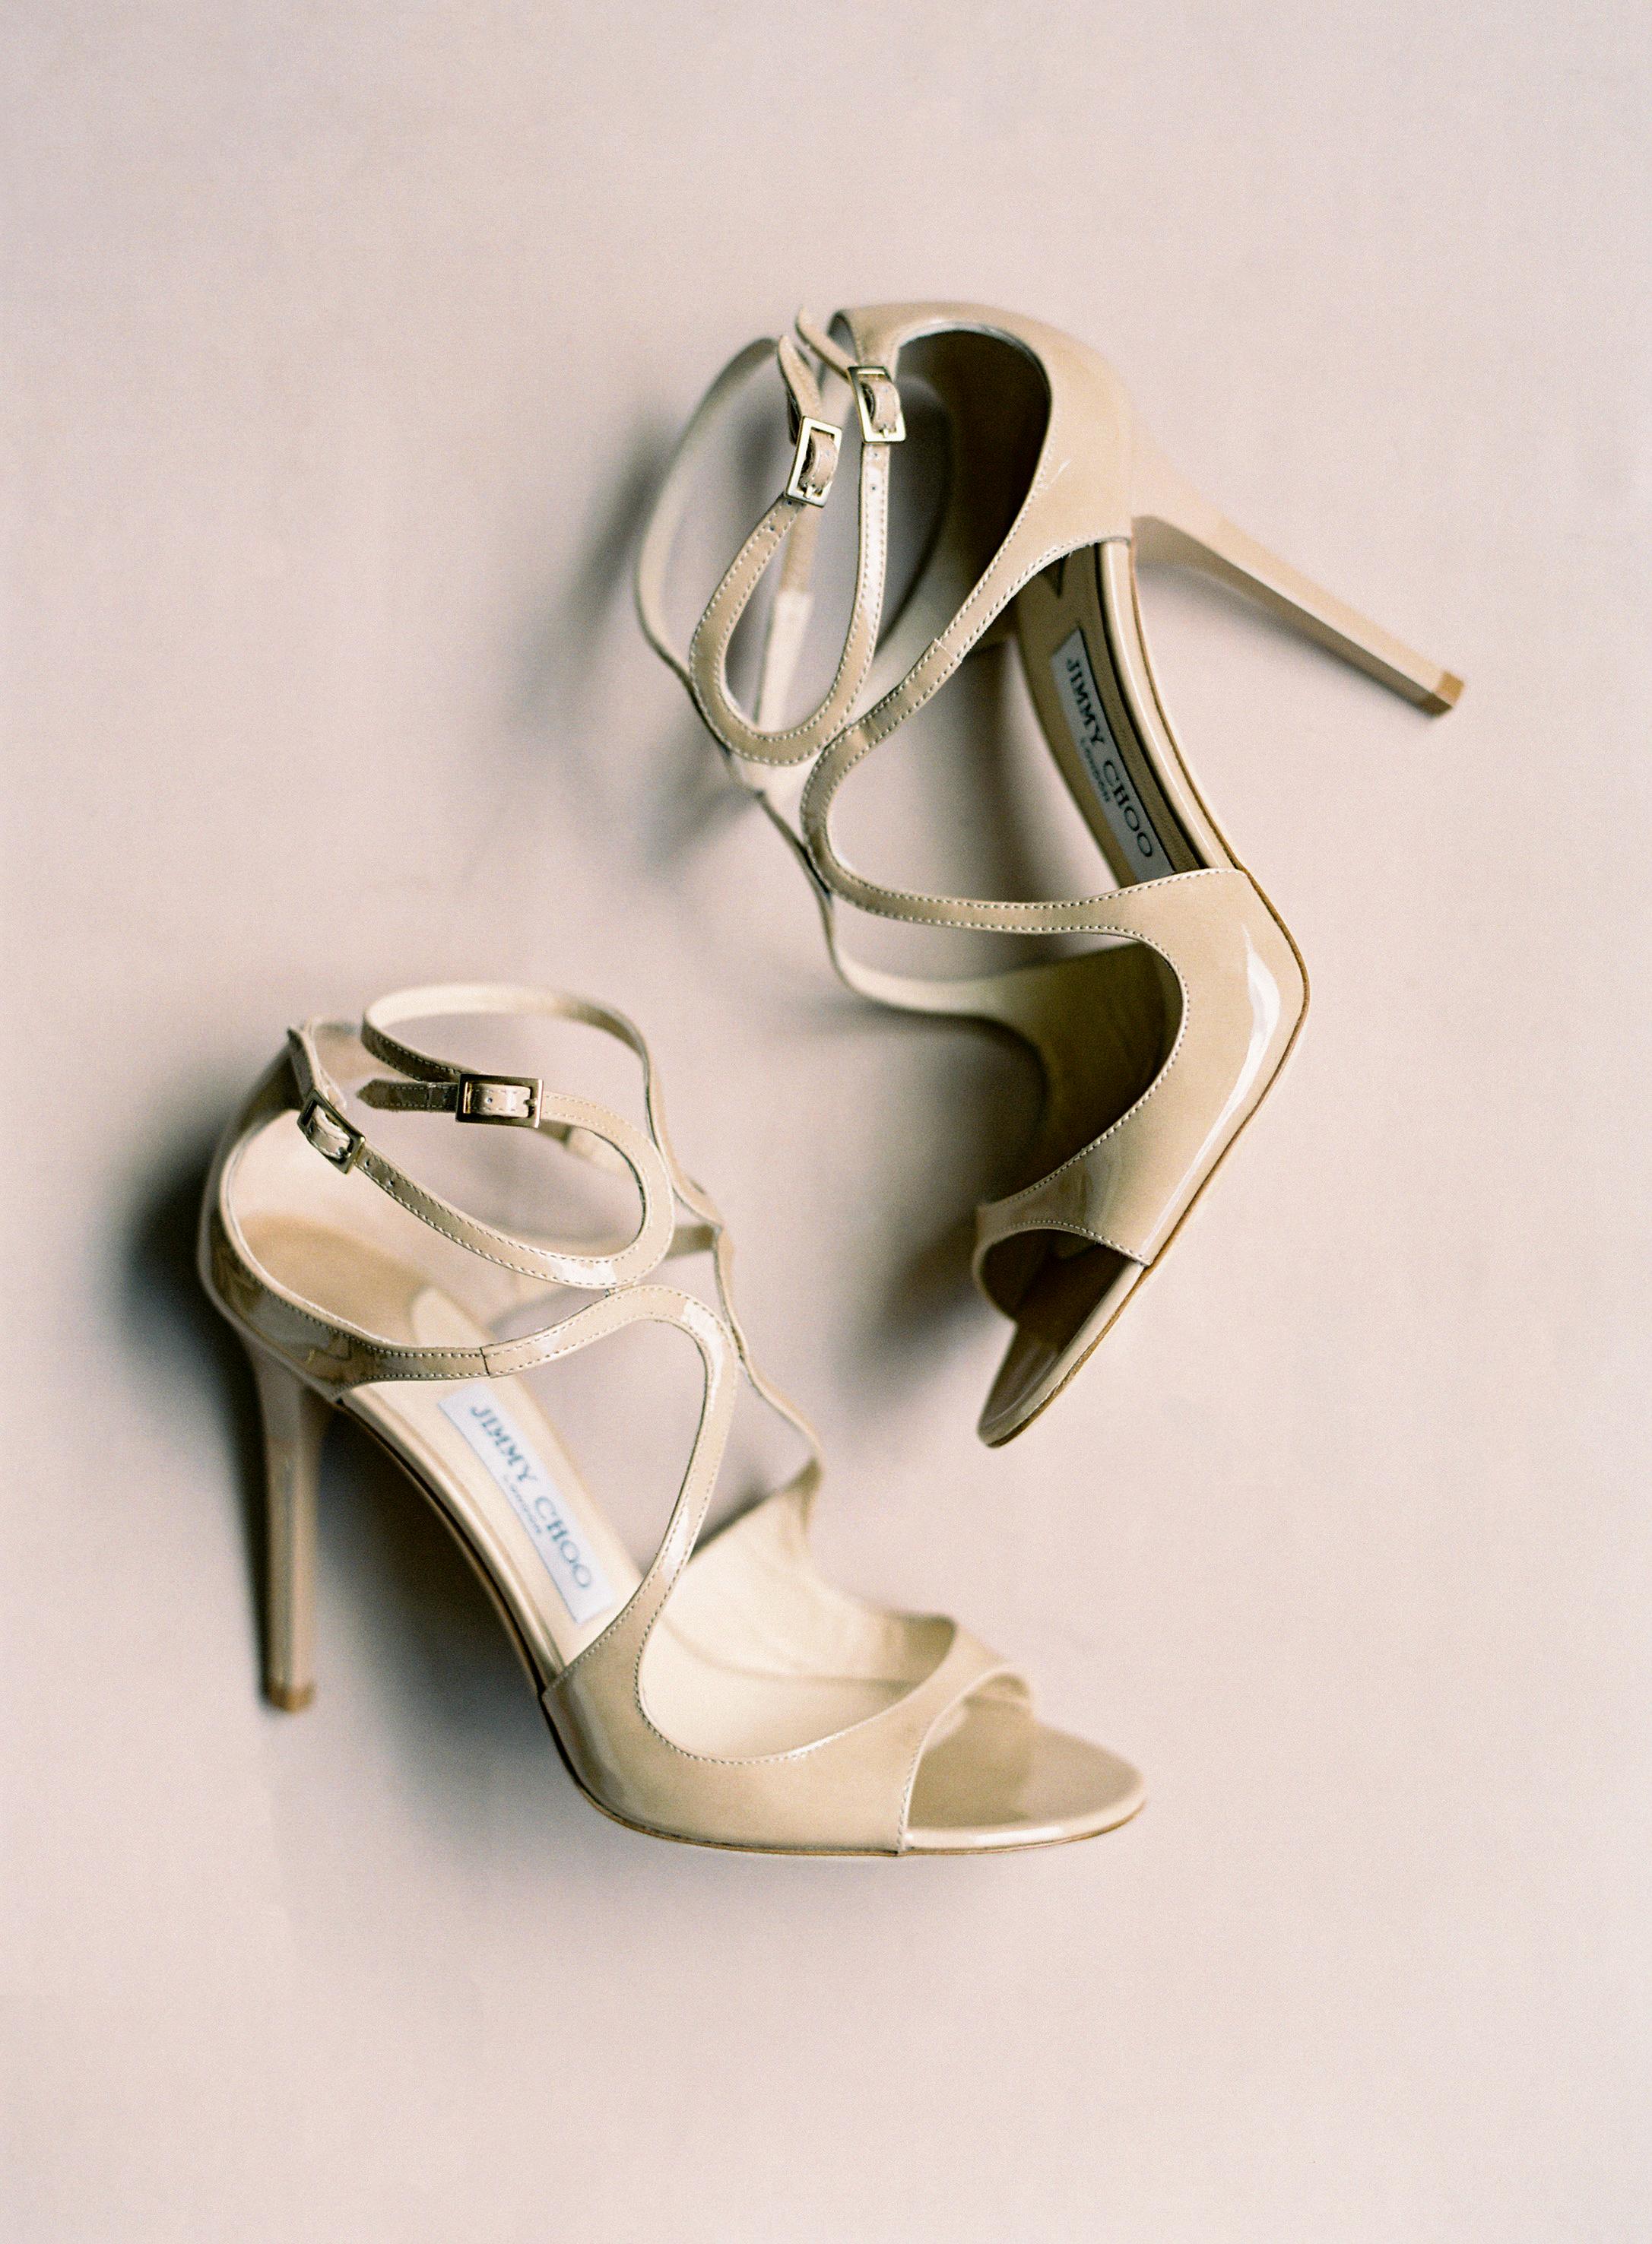 Jimmy Choo Bridal Boutique- Wedding Shoes